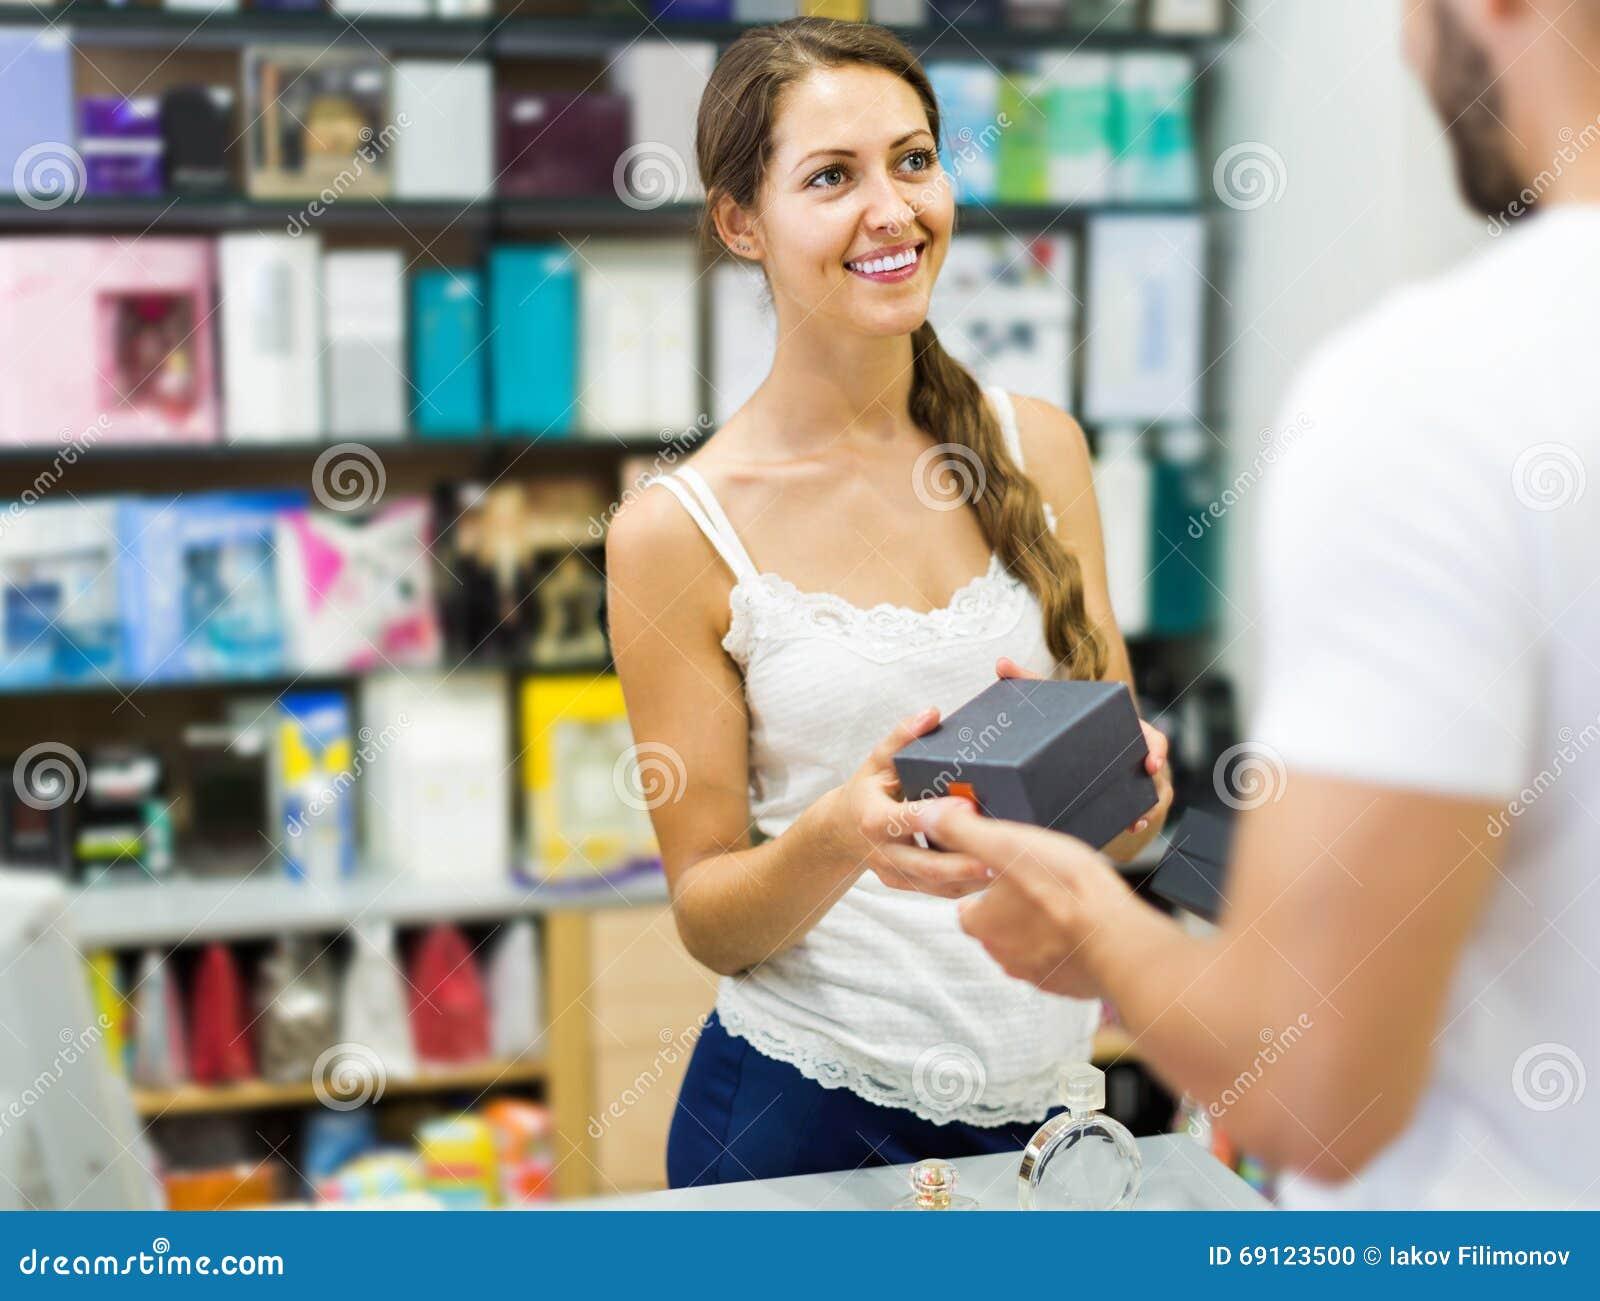 Cliente na loja que paga na mesa da caixa registadora